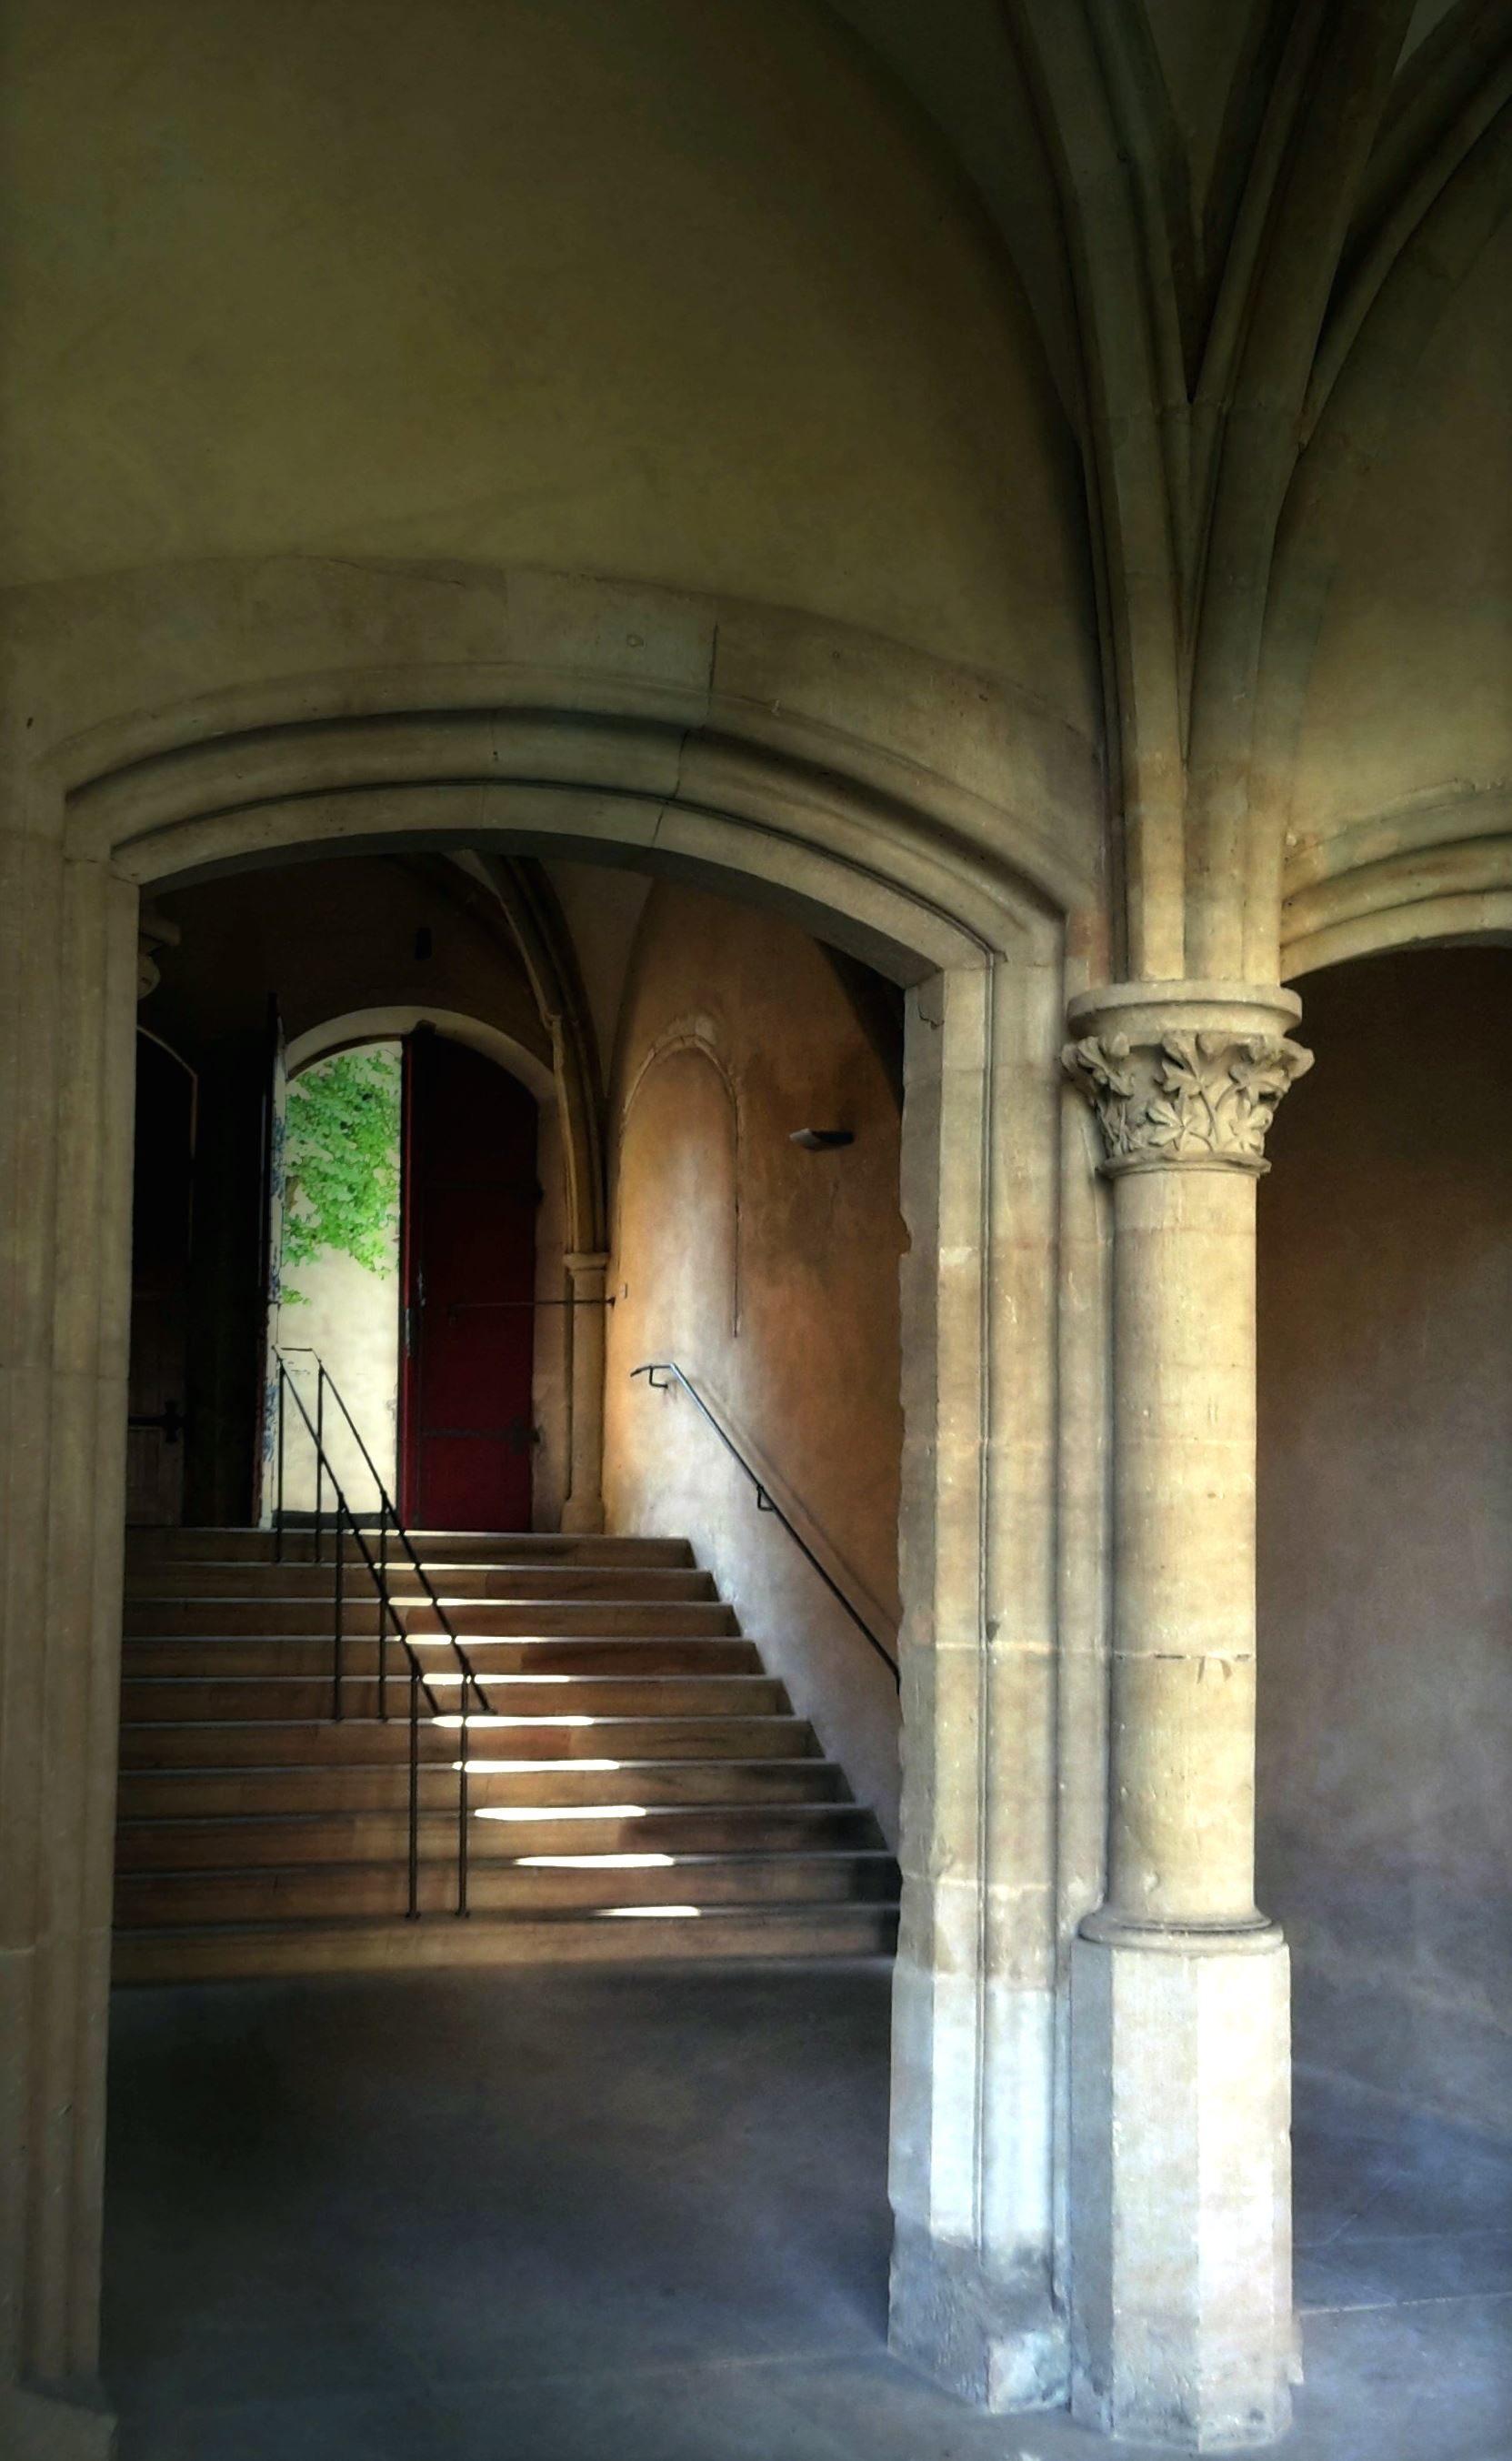 Free Picture Pillar Railings Stairs Stone Door Walls